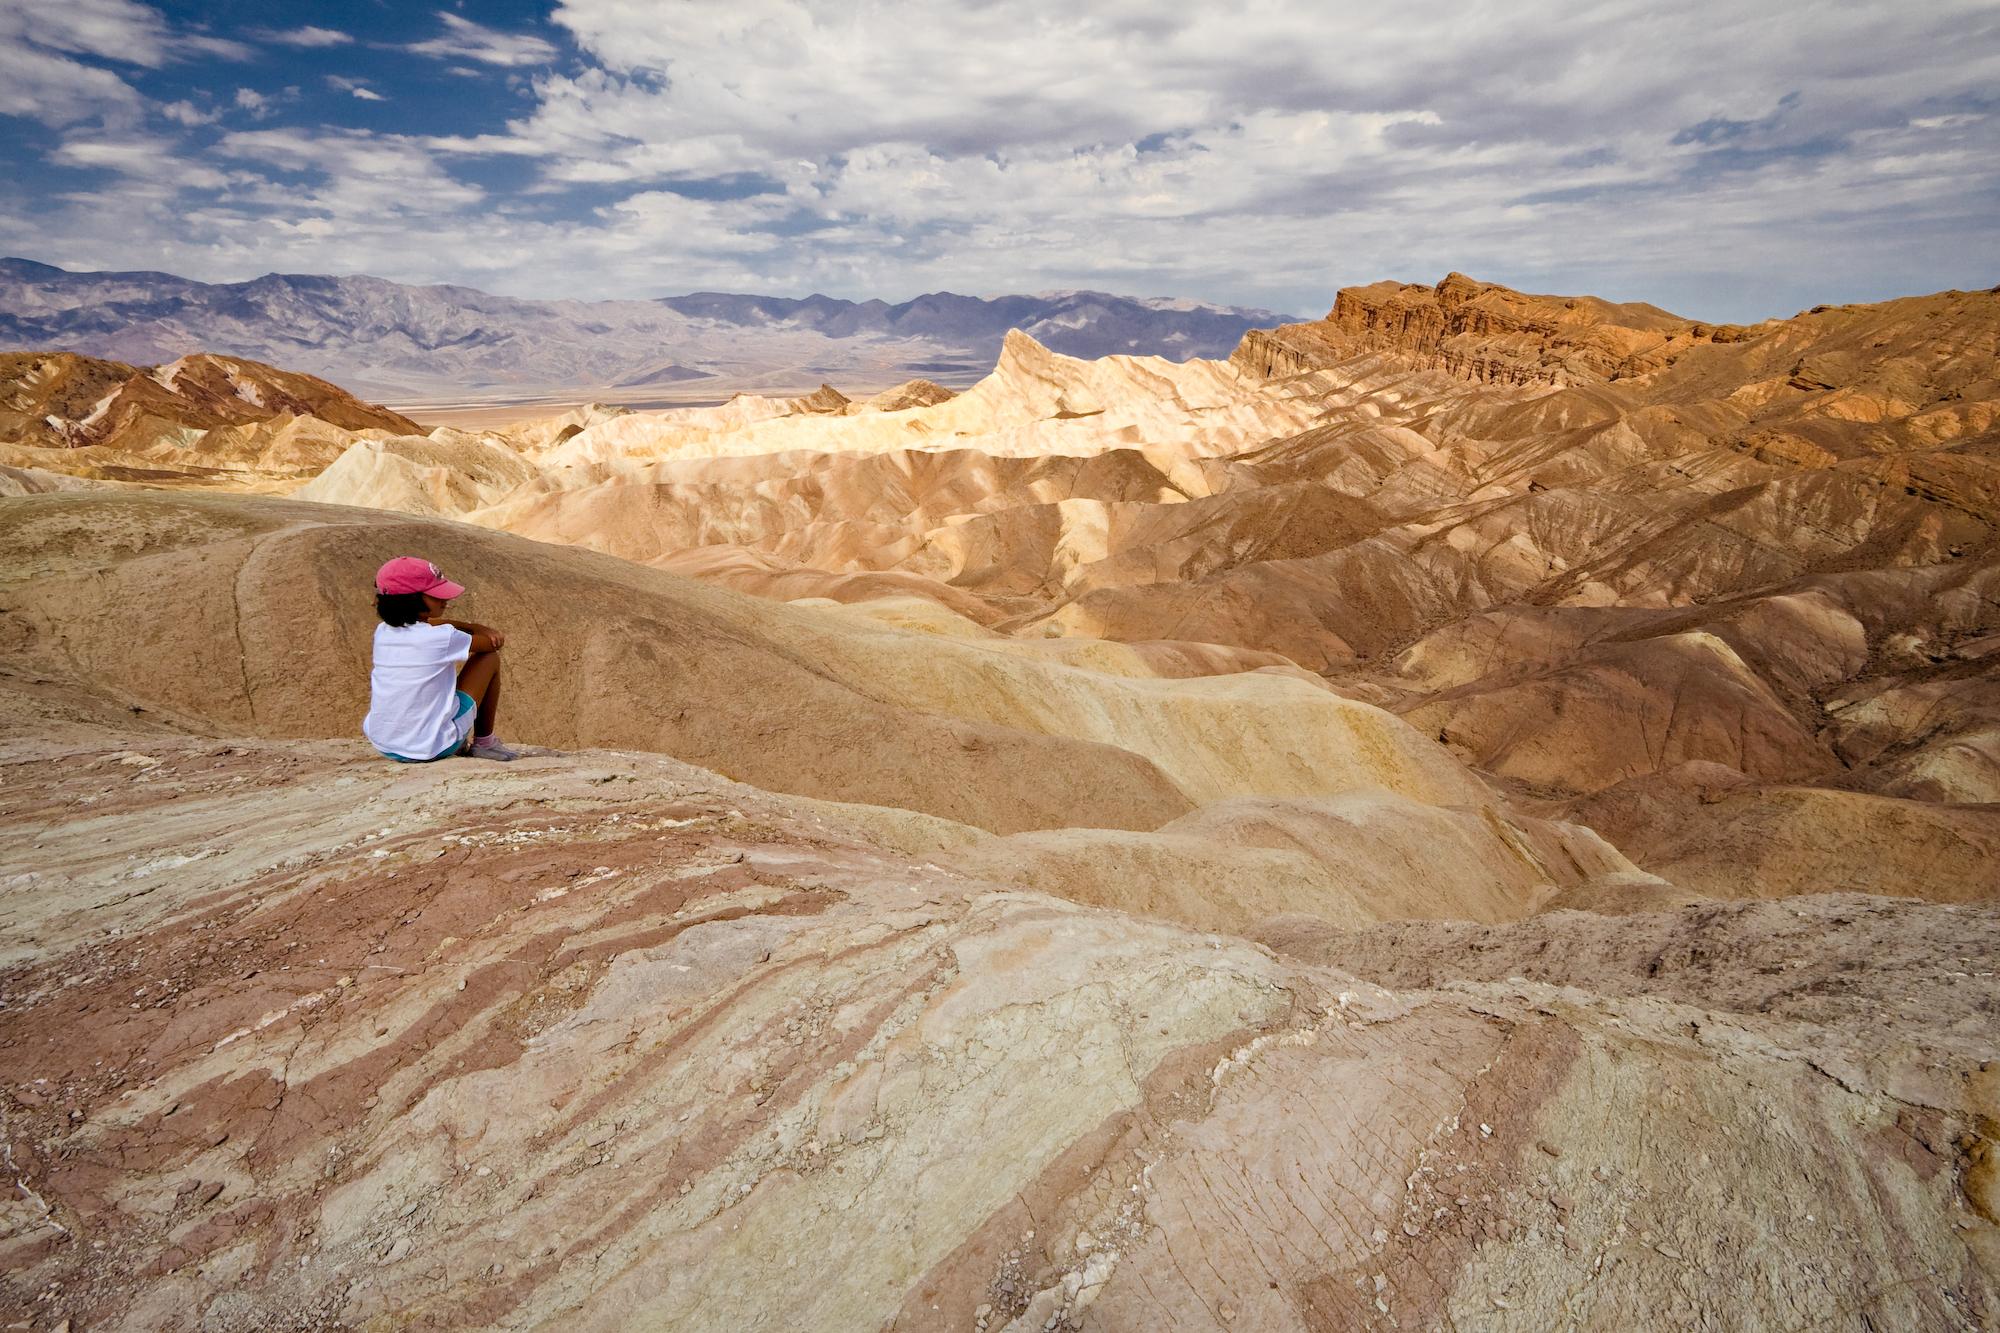 Death Valley Usa File:usa 10789 Death Valley